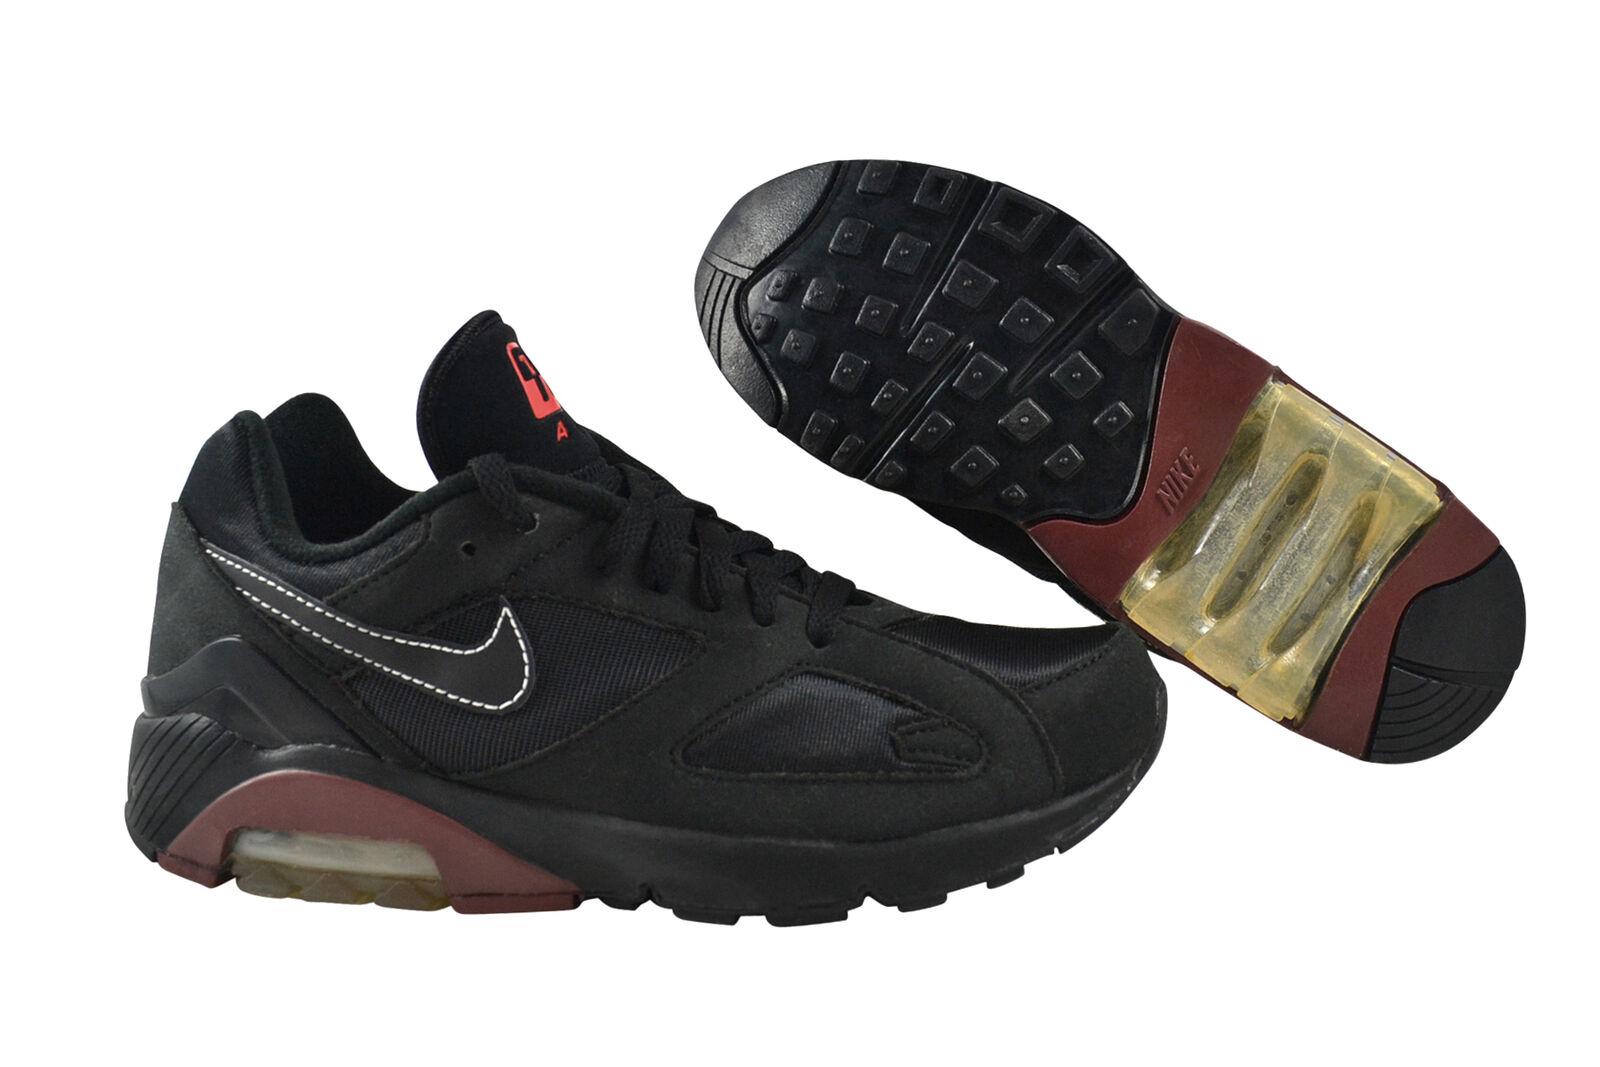 Nike AIR 180 schwarz Turnschuhe Pimento Pack schwarz 310155 001